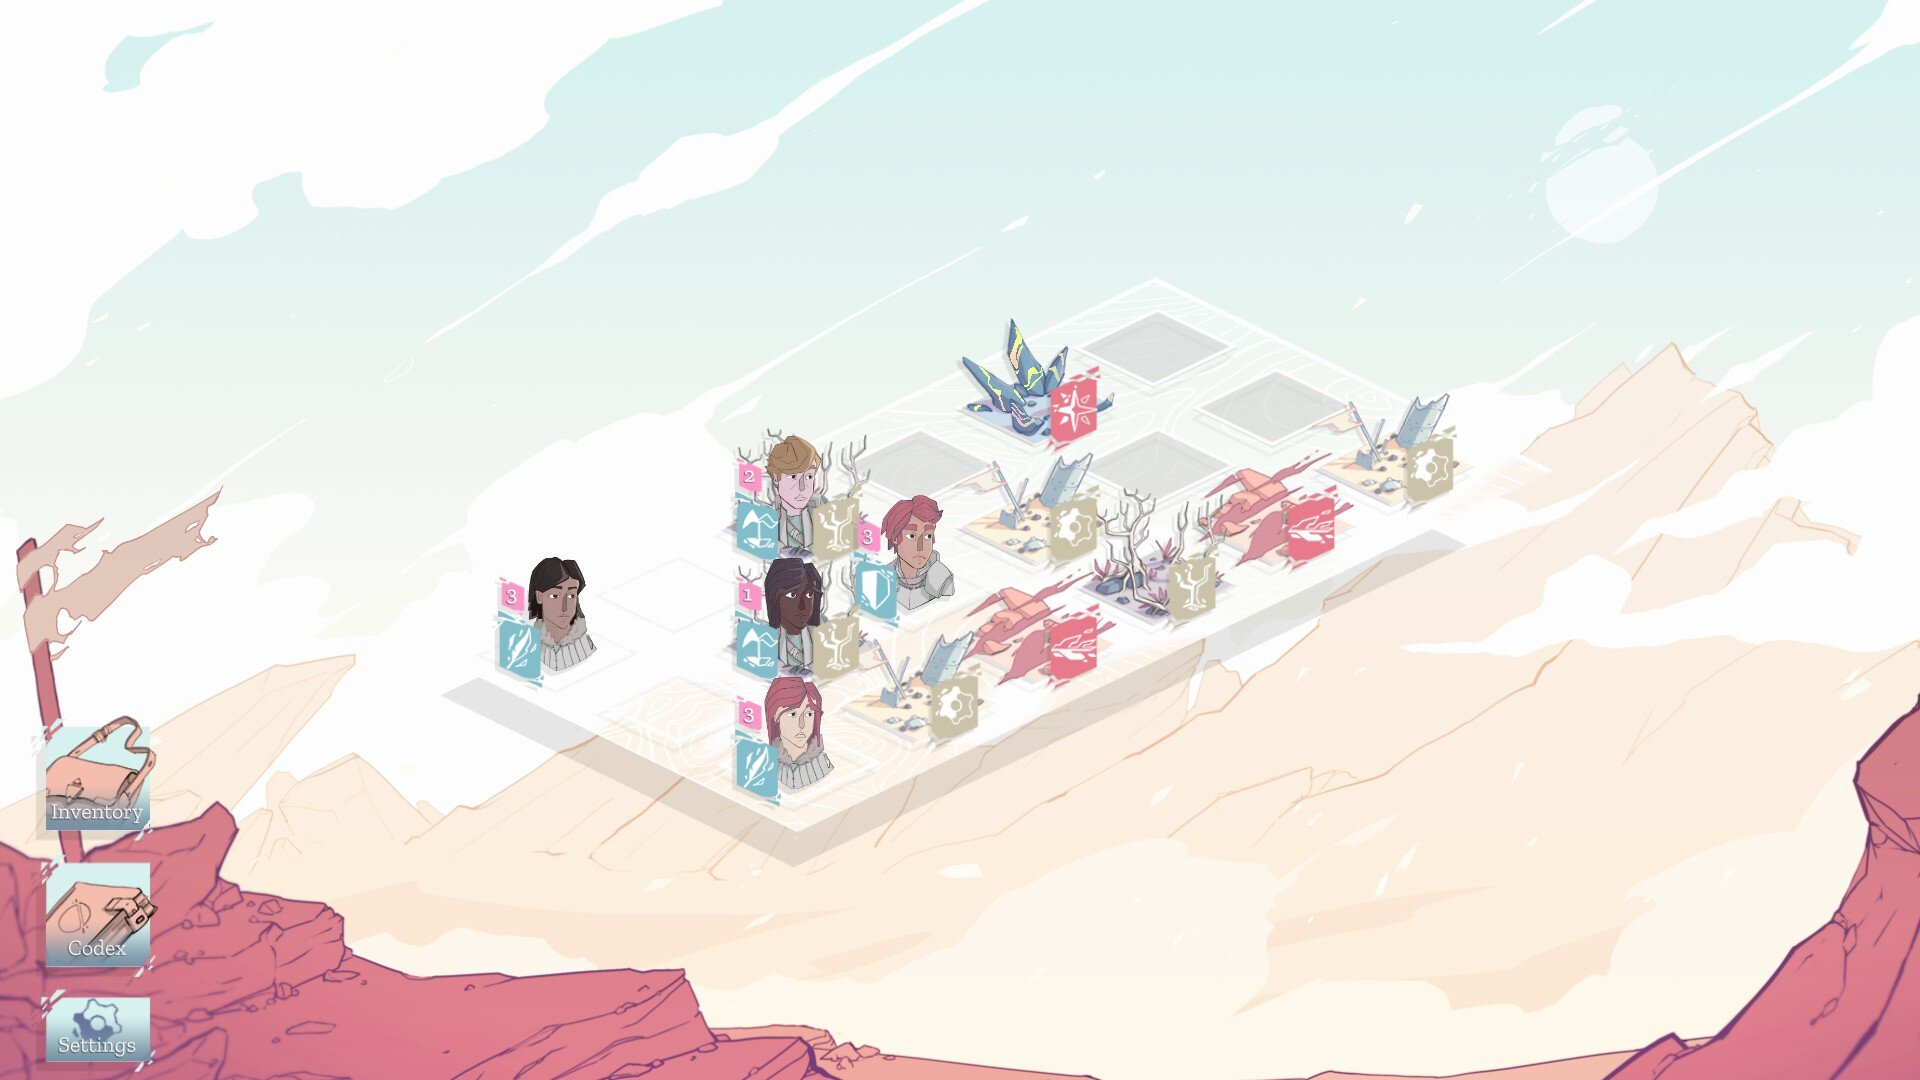 Moonfall game screenshot